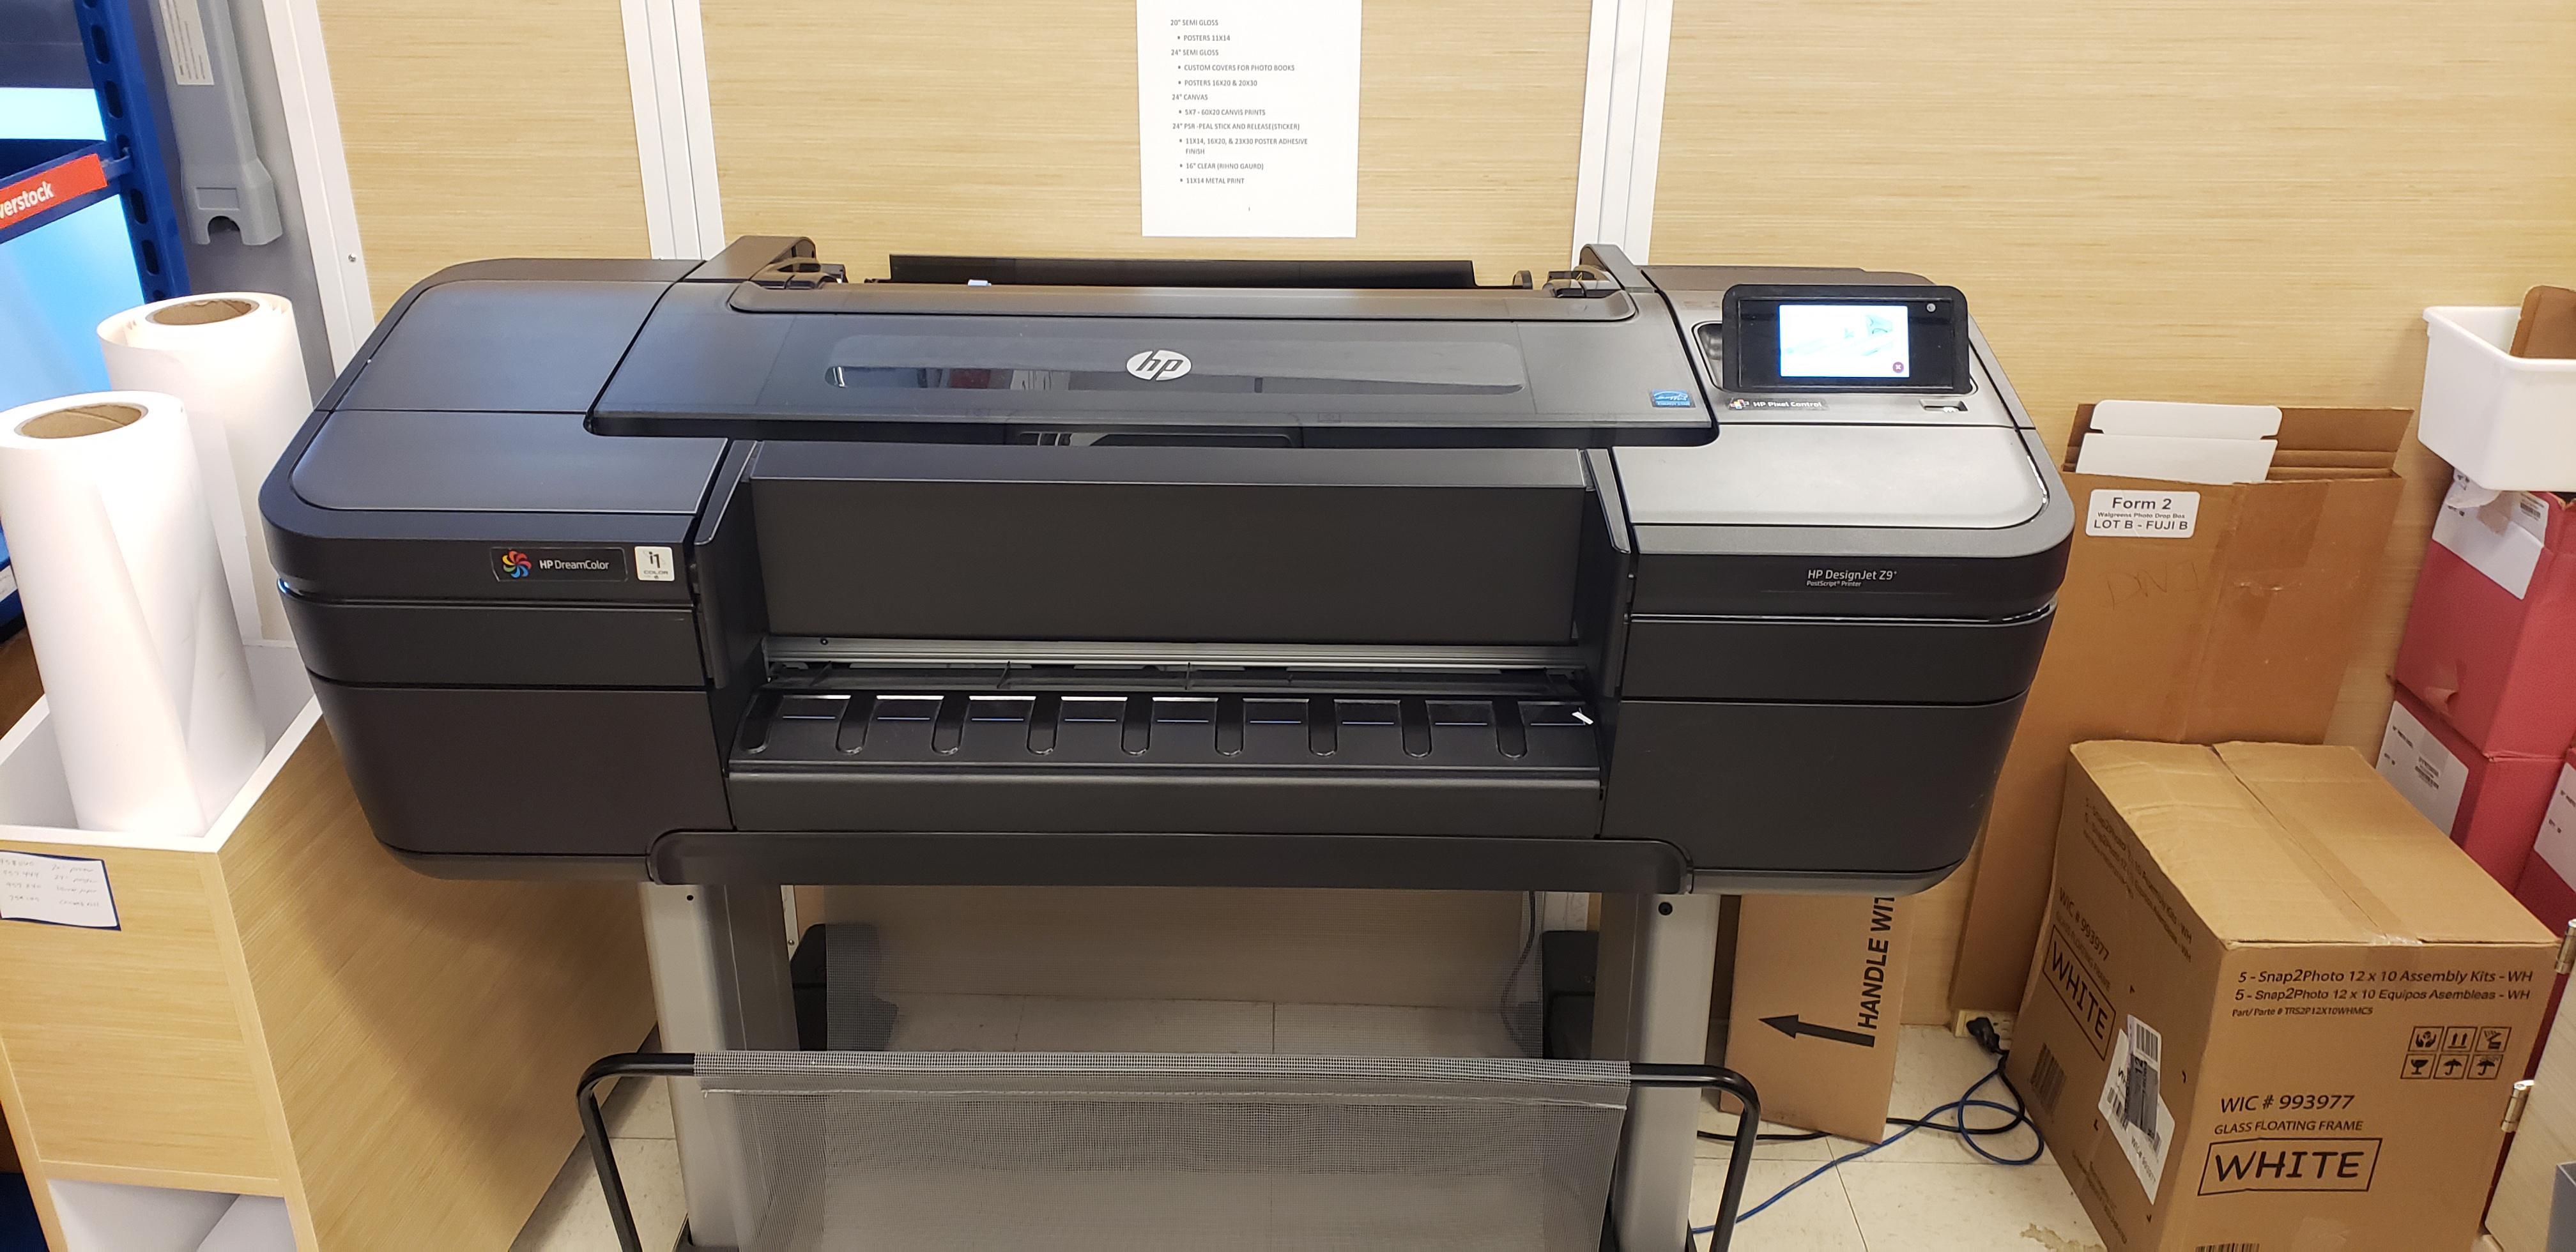 help hp printer issues can anyone